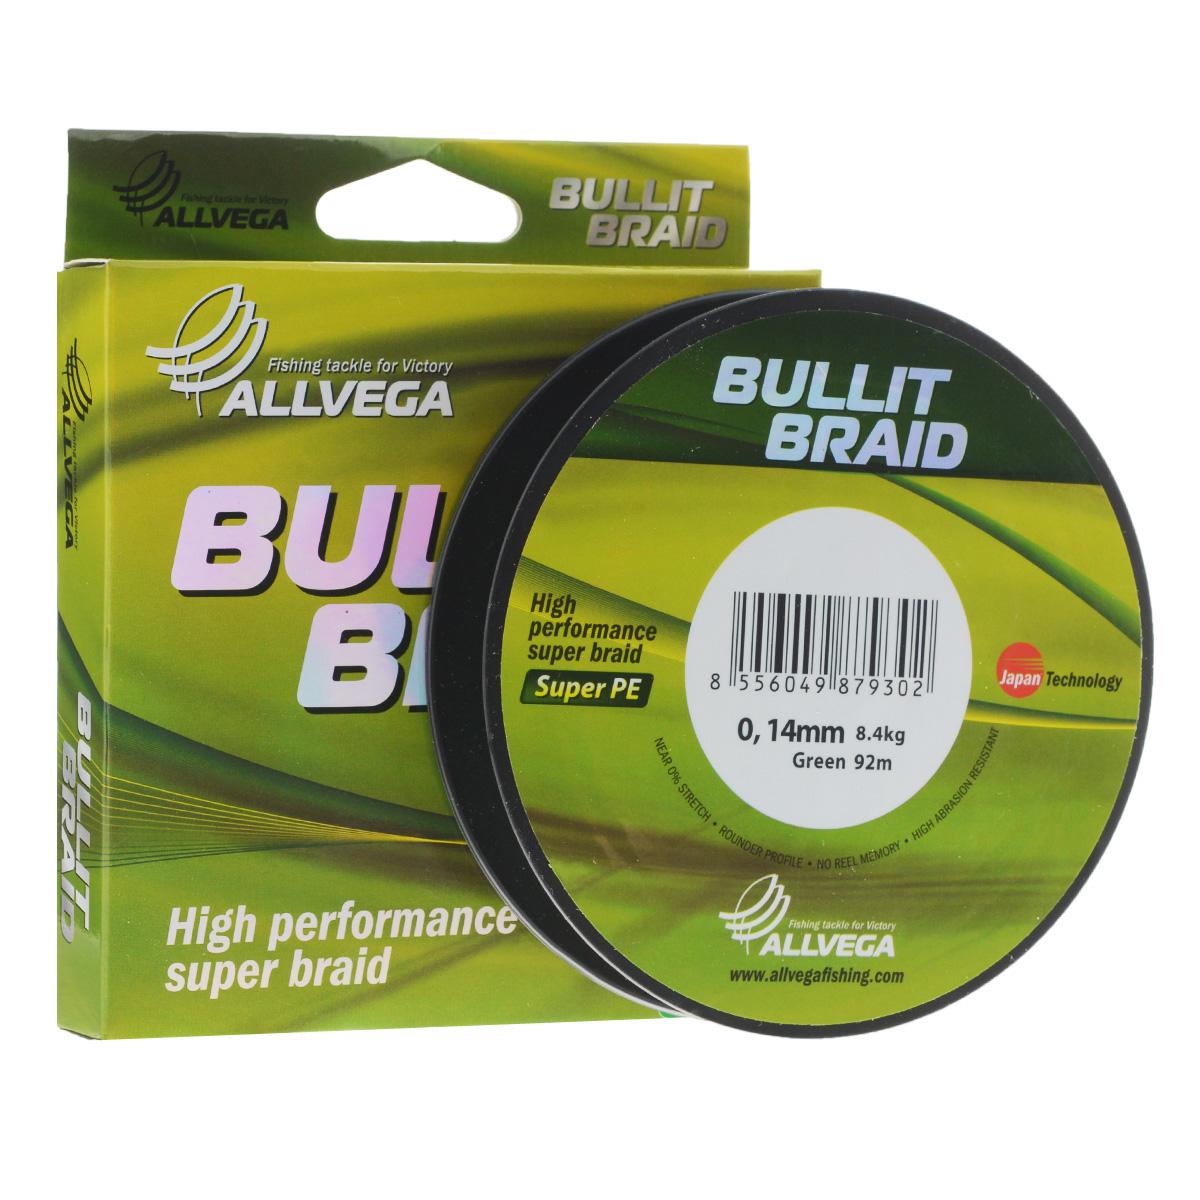 Леска плетеная Allvega Bullit Braid, цвет: темно-зеленый, 92 м, 0,14 мм, 8,4 кг